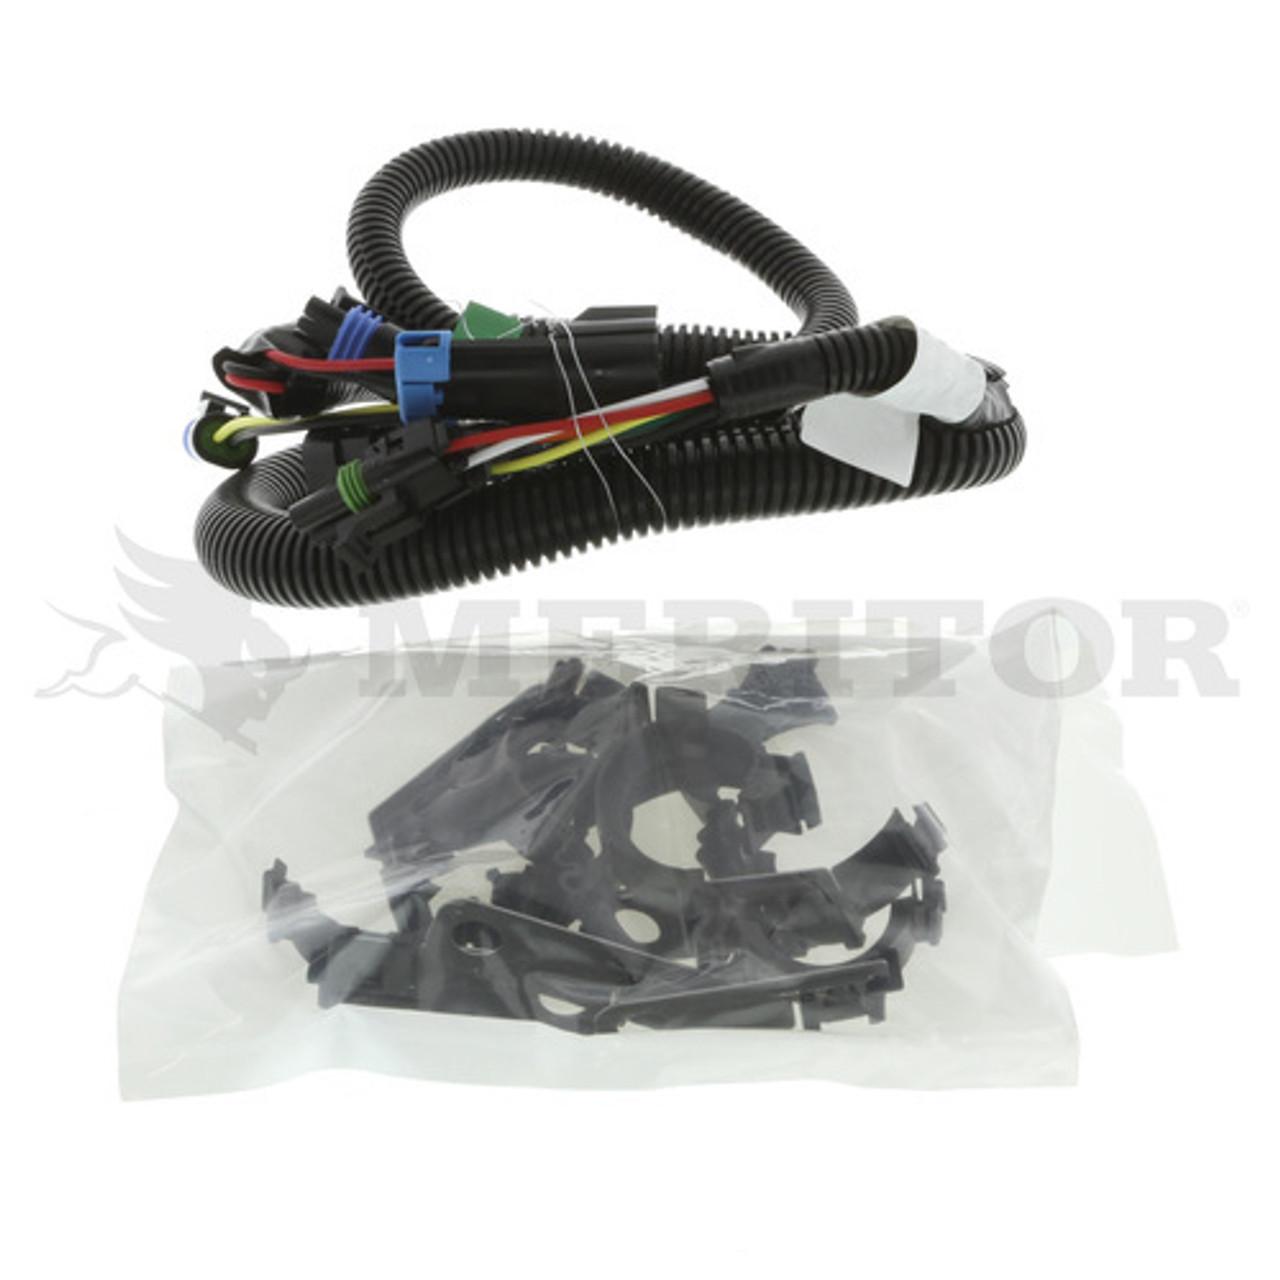 KIT5431 Rockwell Meritor Transmission Wiring Harness Kit G on